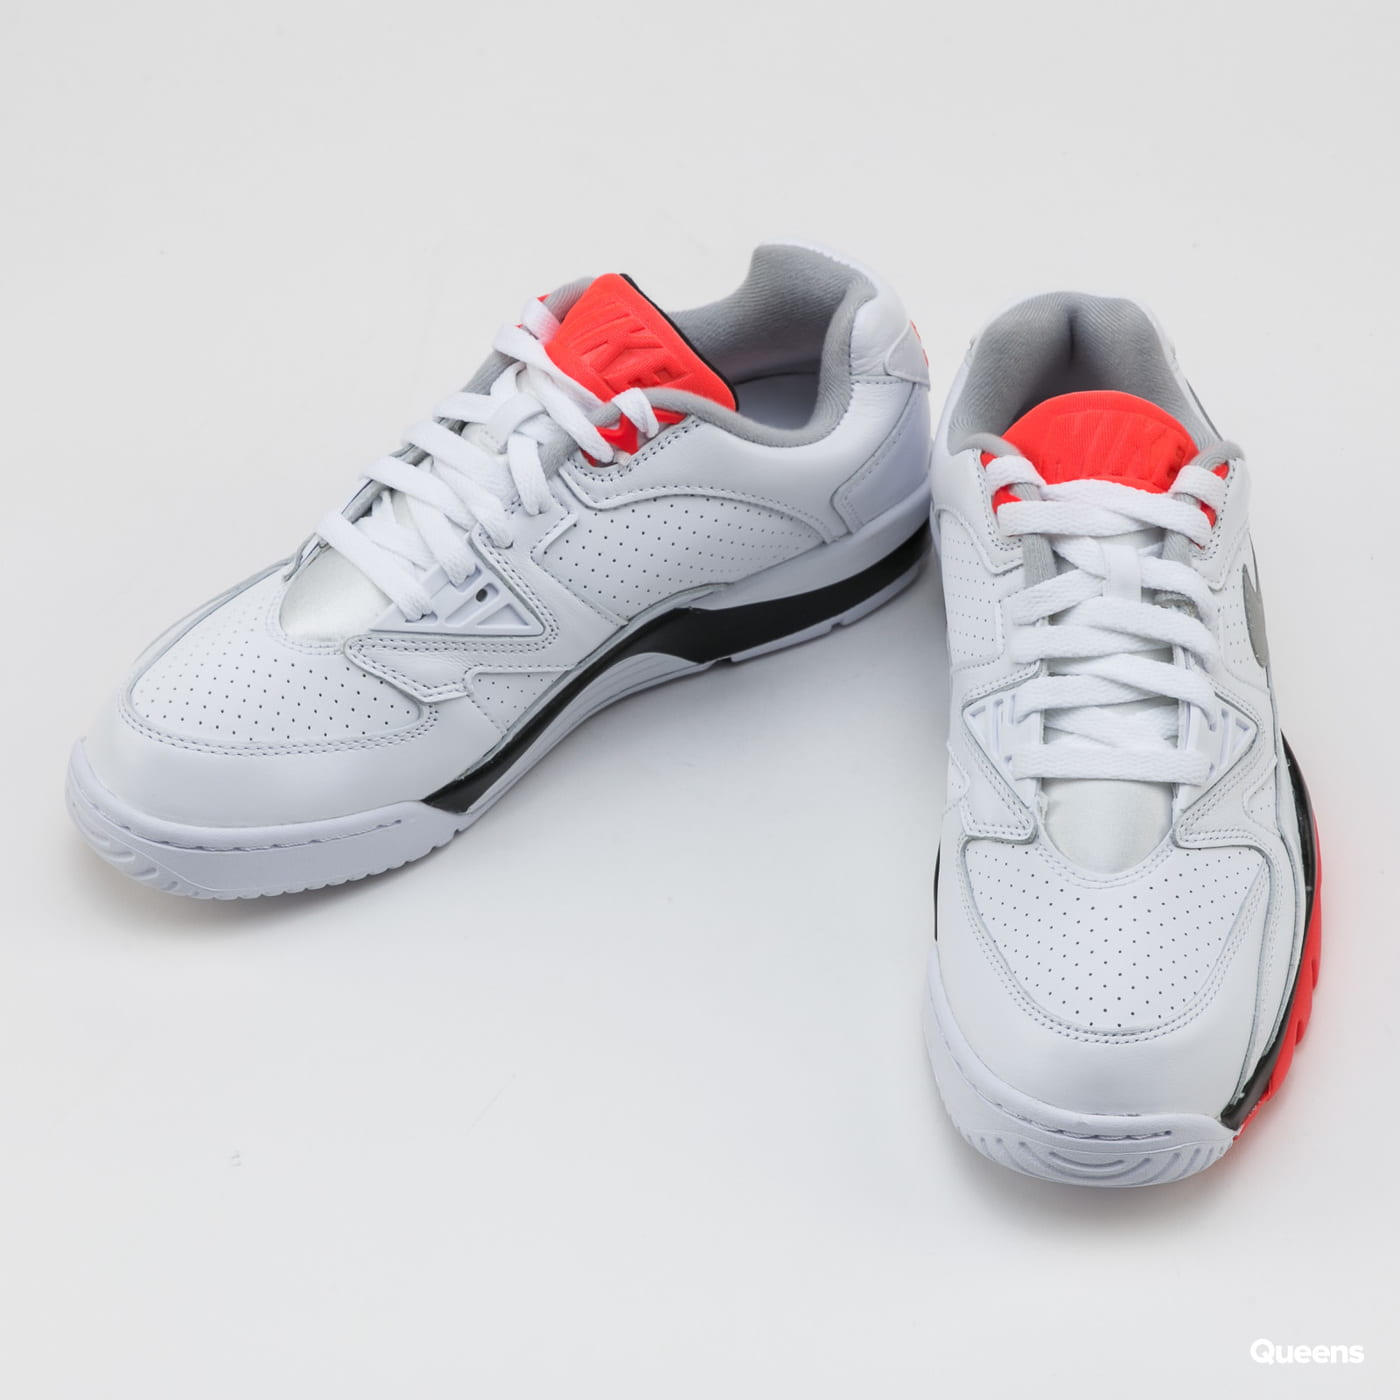 Nike Air Gross Trainer 3 Low white / lt smoke grey